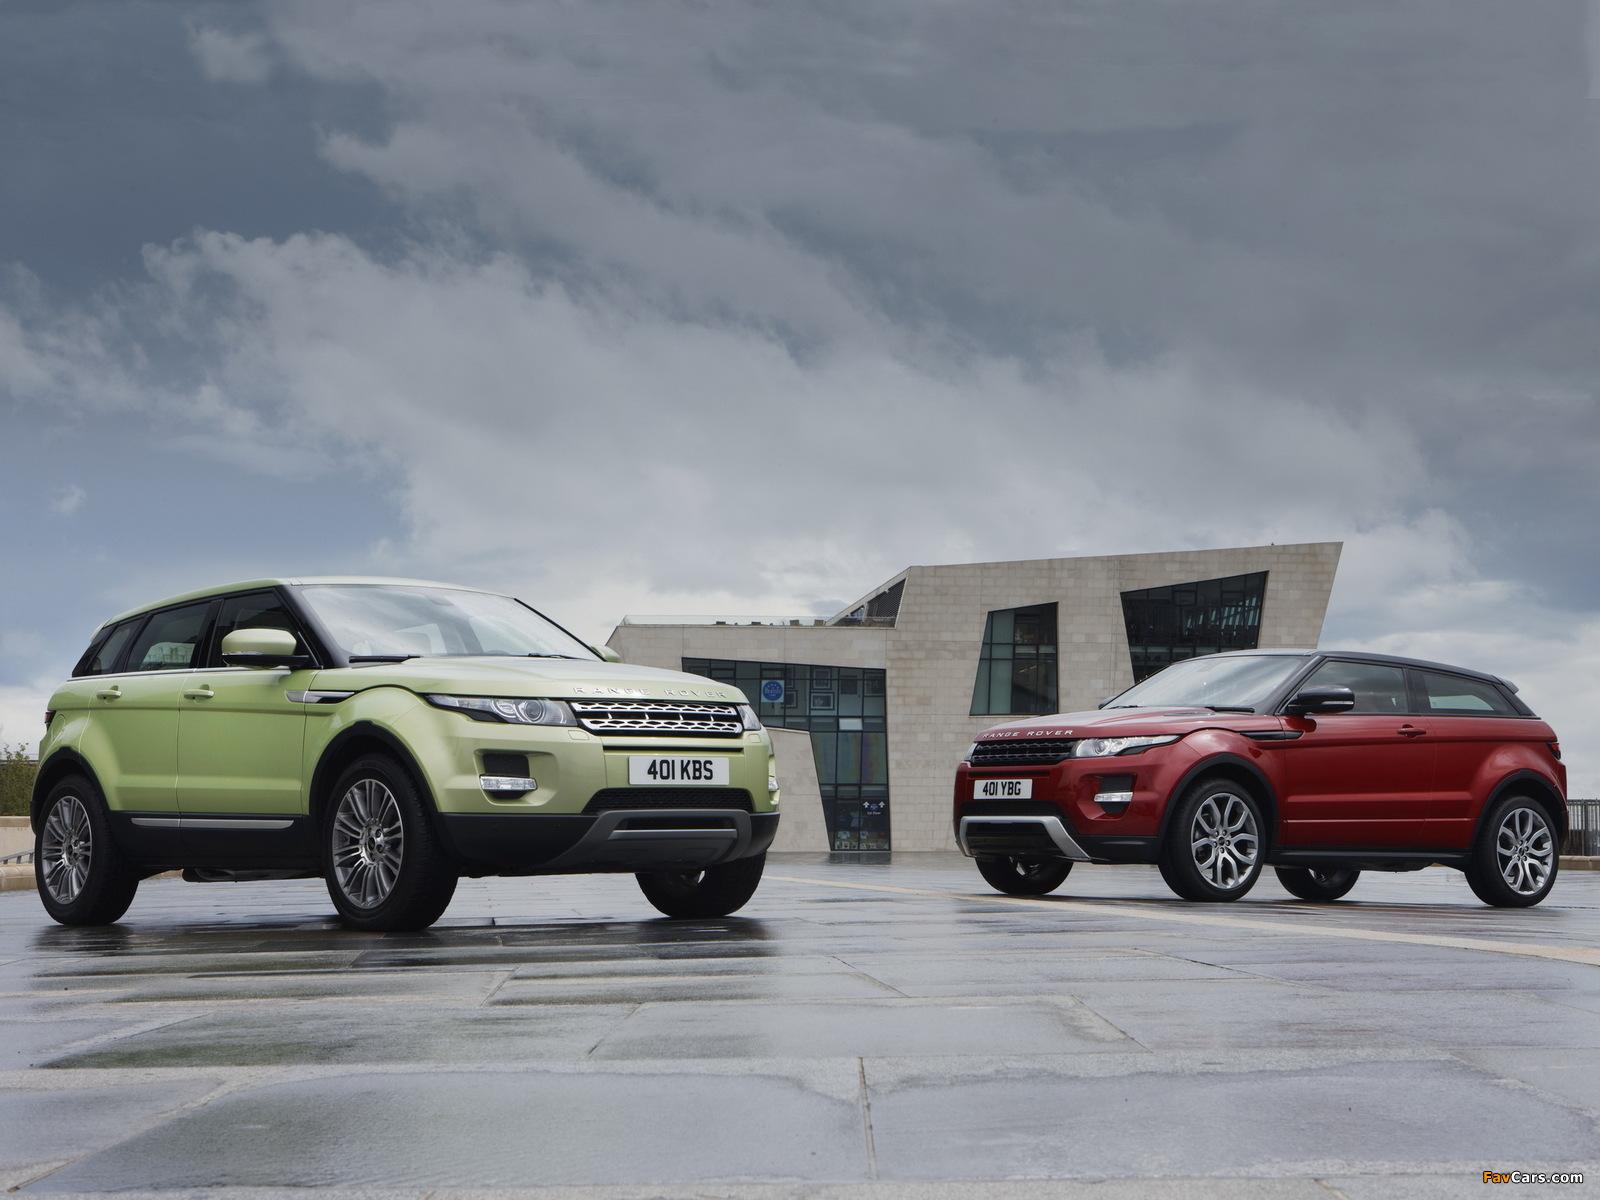 Land Rover Range Rover Evoque images (1600 x 1200)